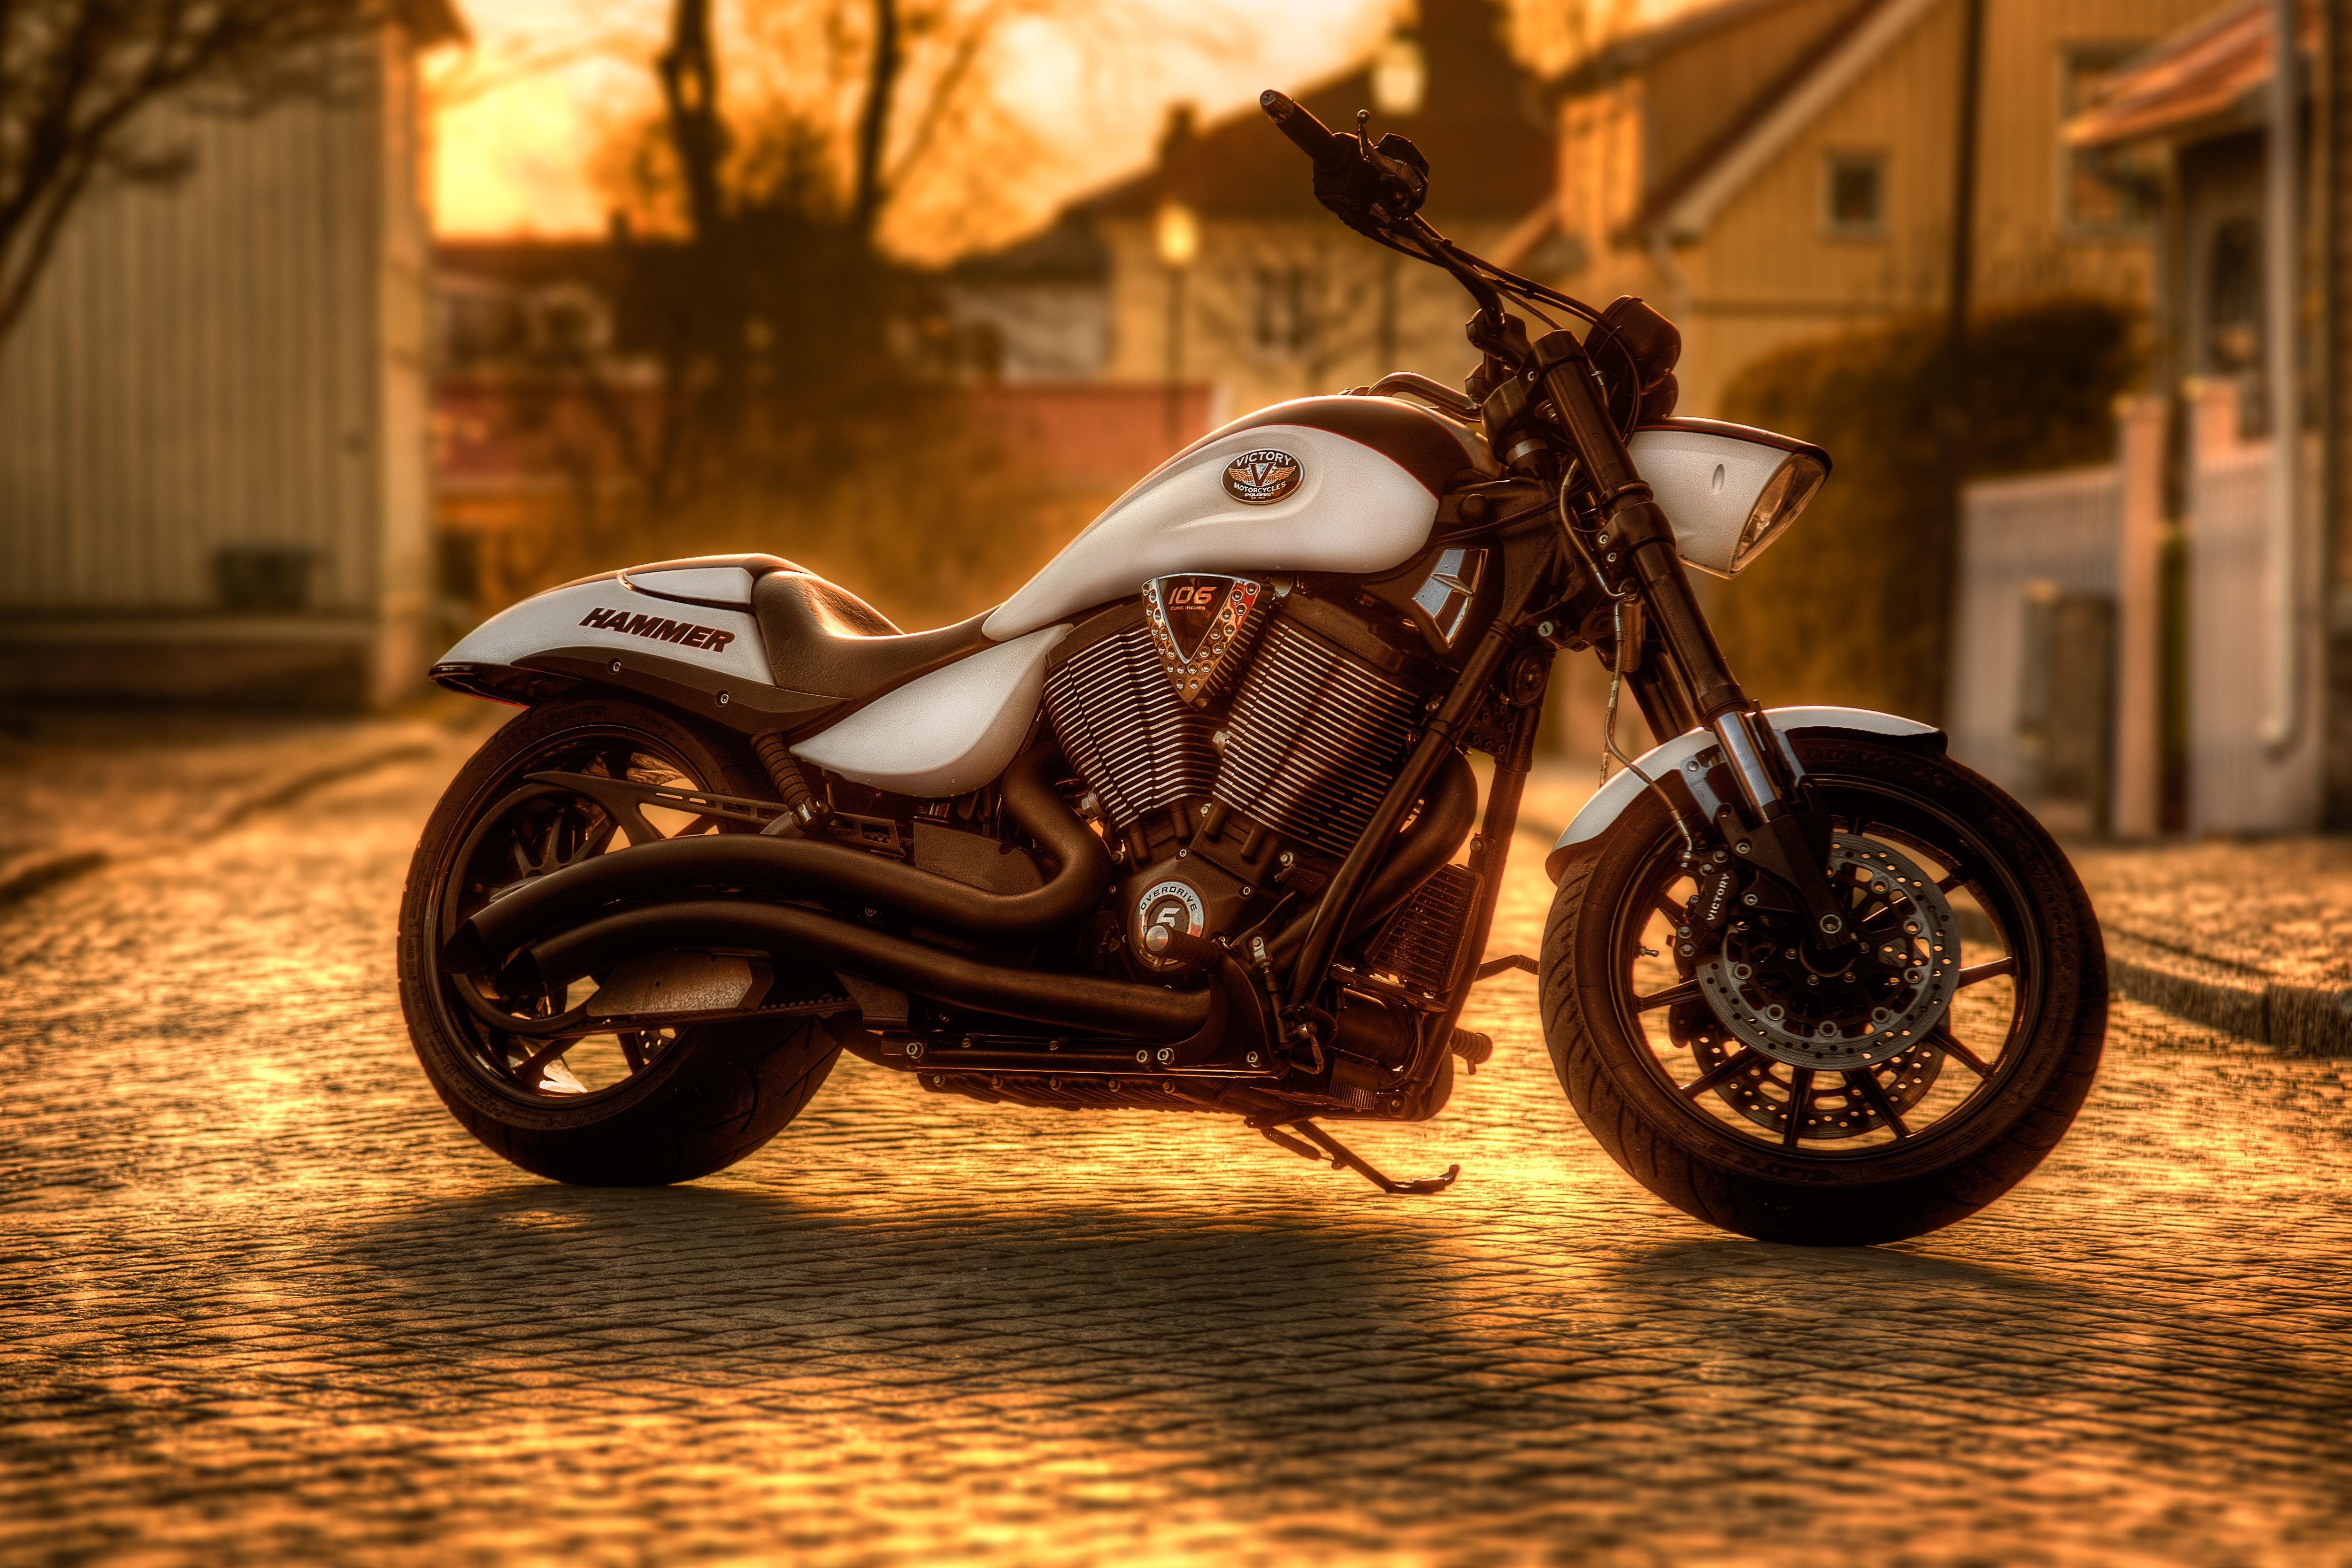 Motor bike in the sunset ideal for Biking